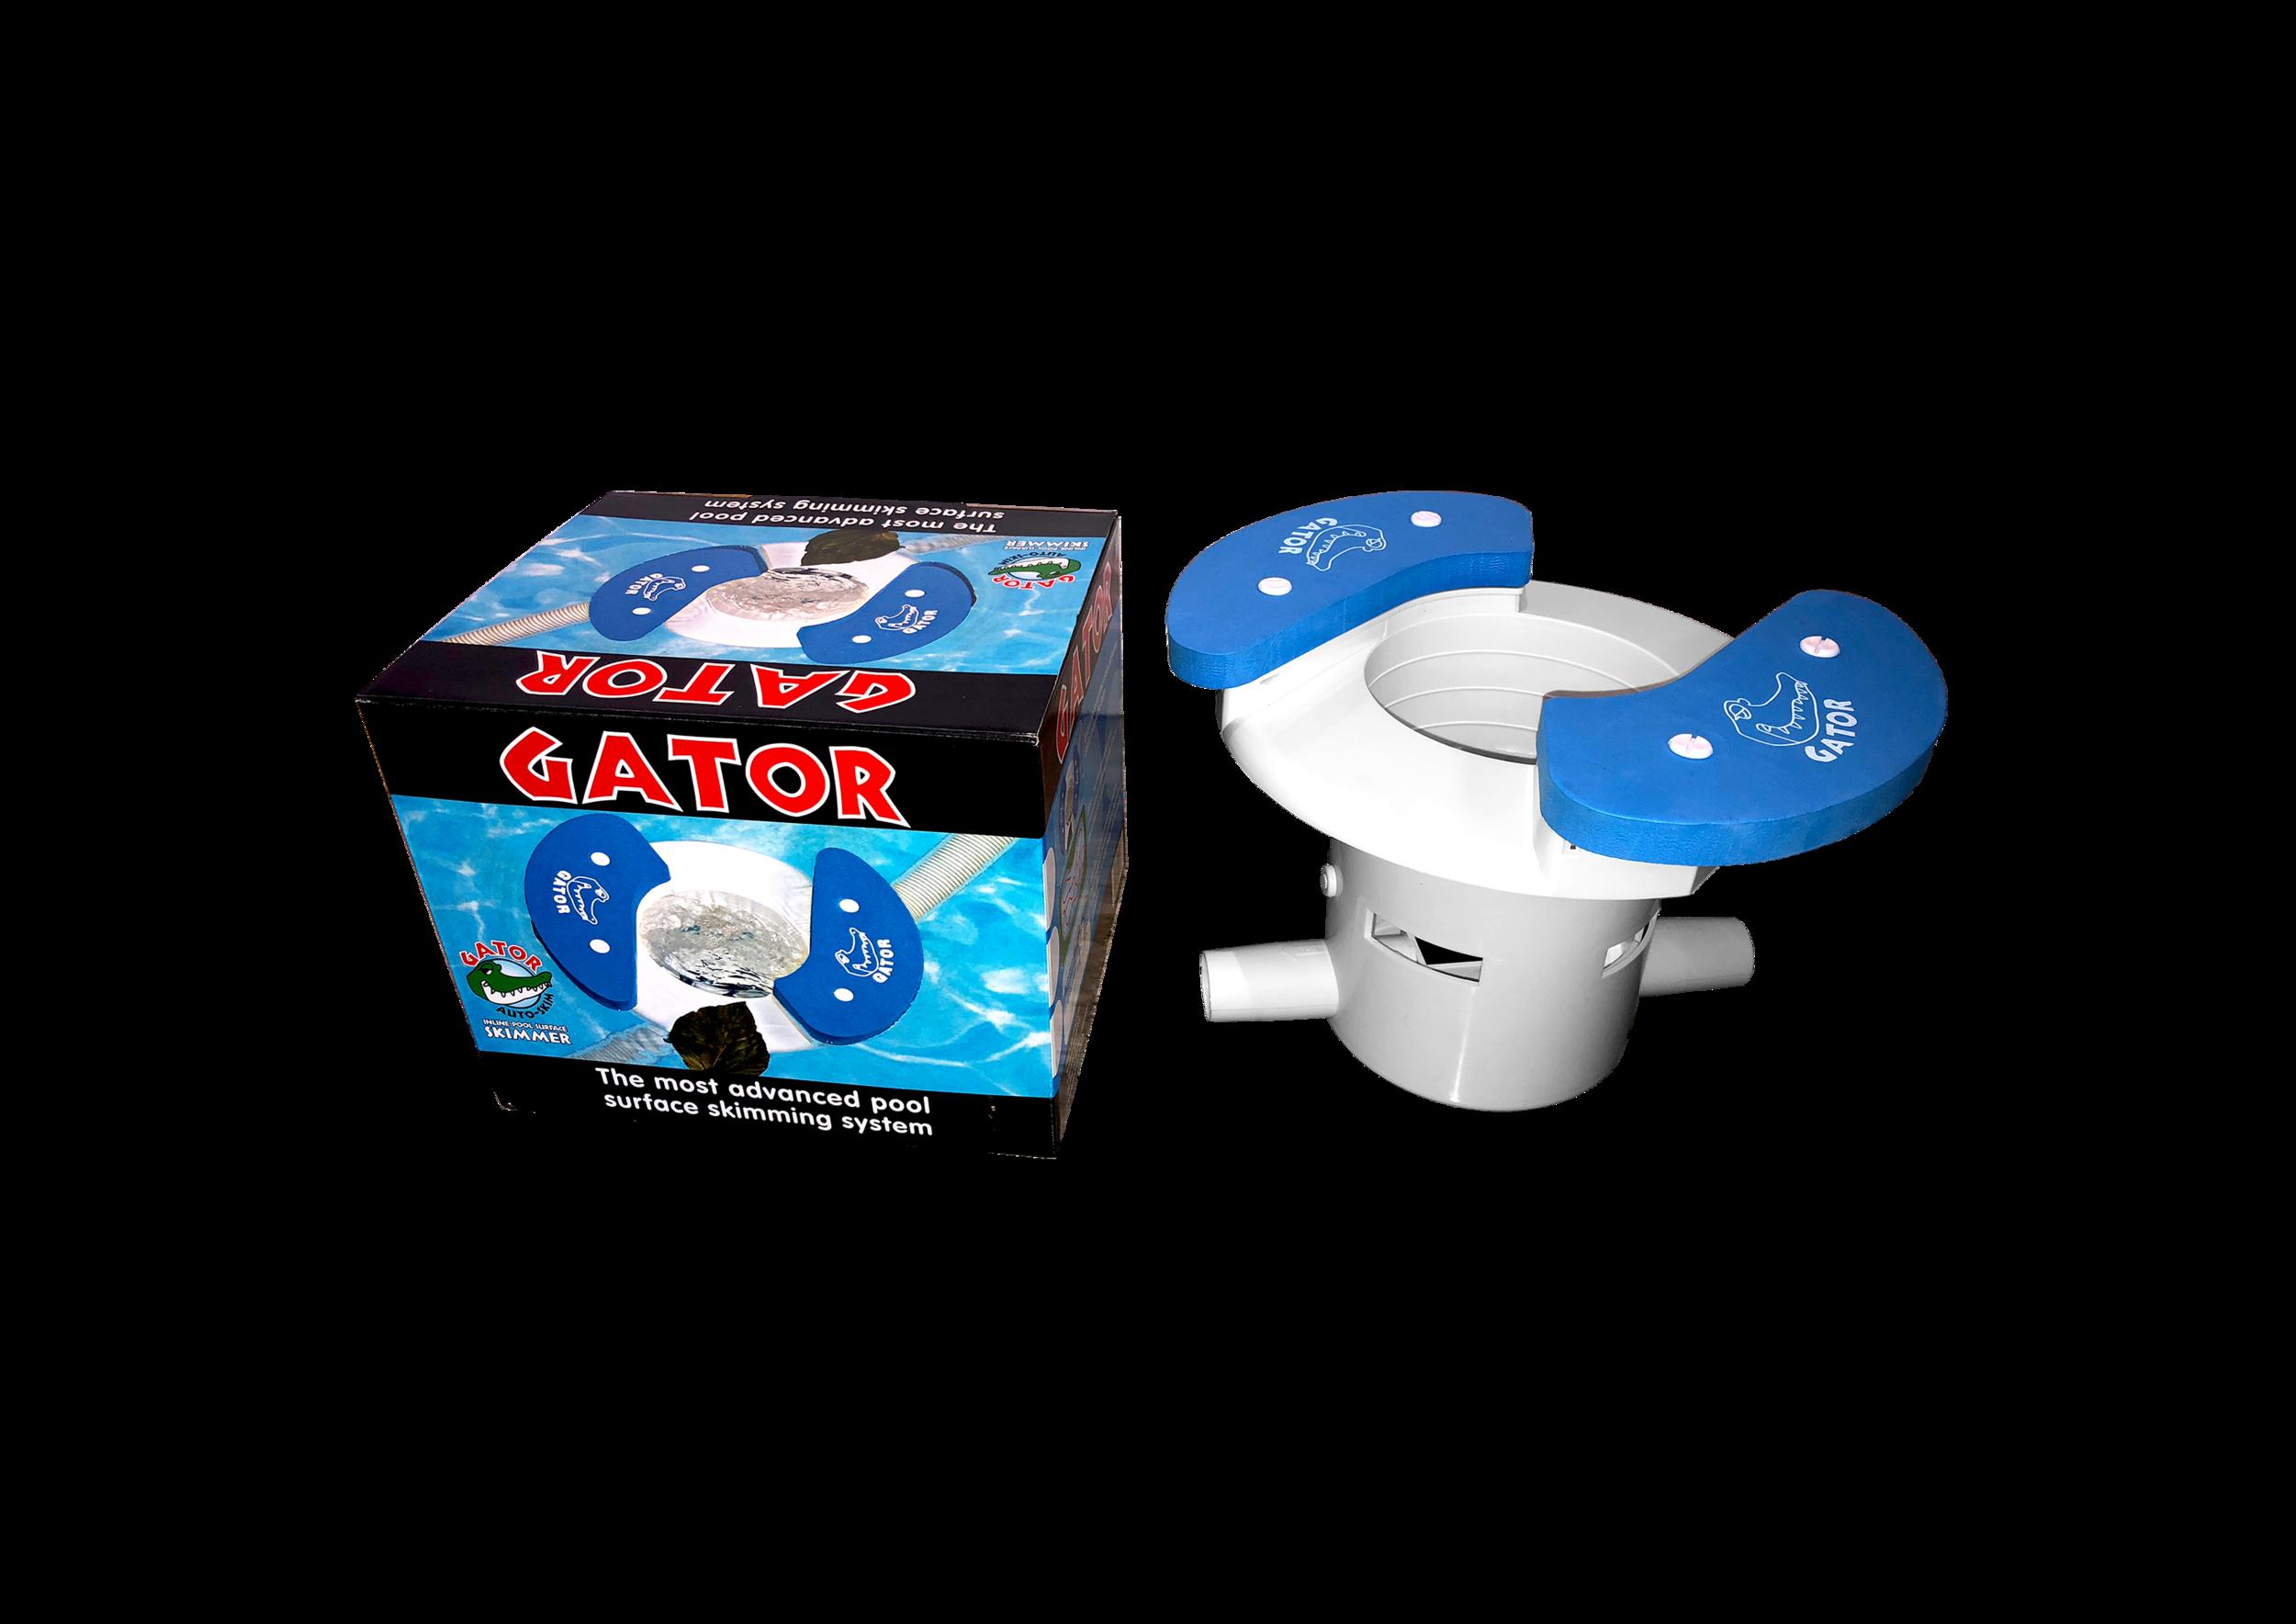 gator + packaging skimmer.png